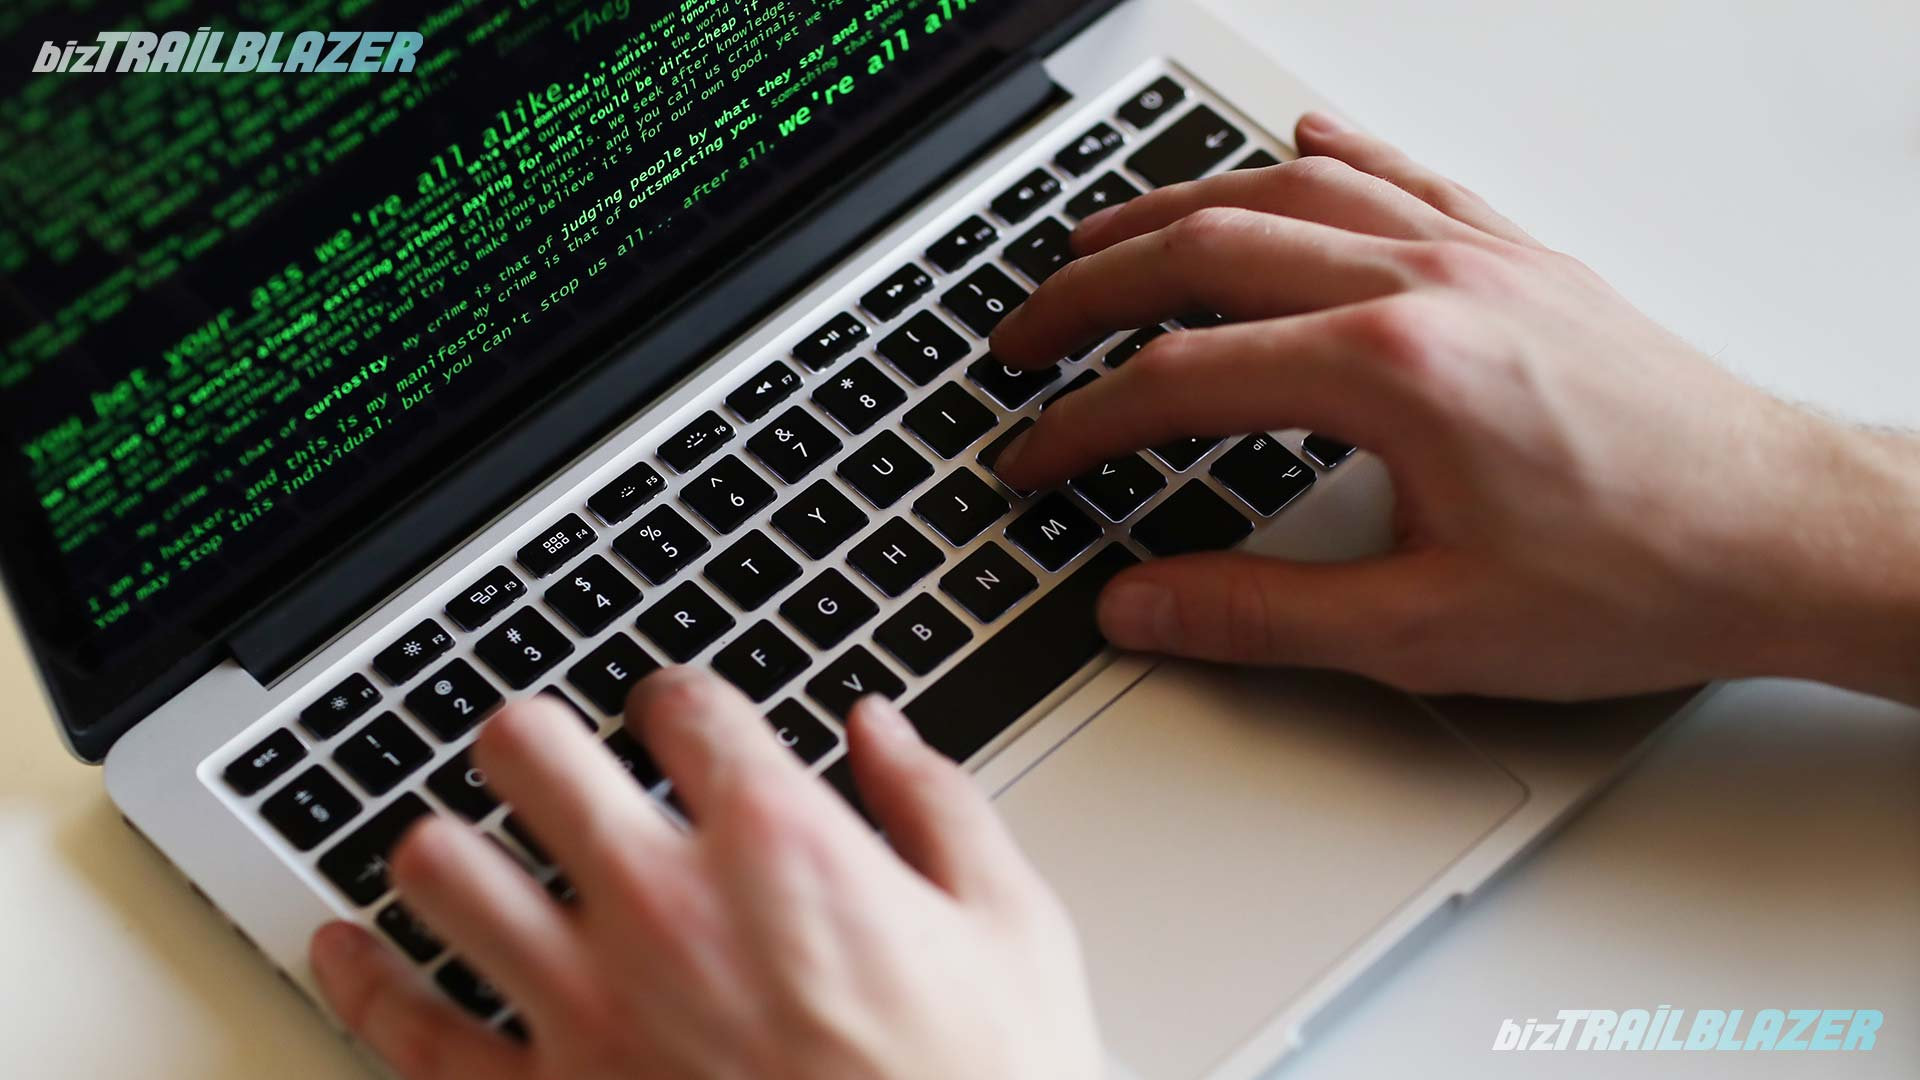 BizTrailBlazer-Blog-Stay-Safe-from-Cybercrimes-in-7-Ways